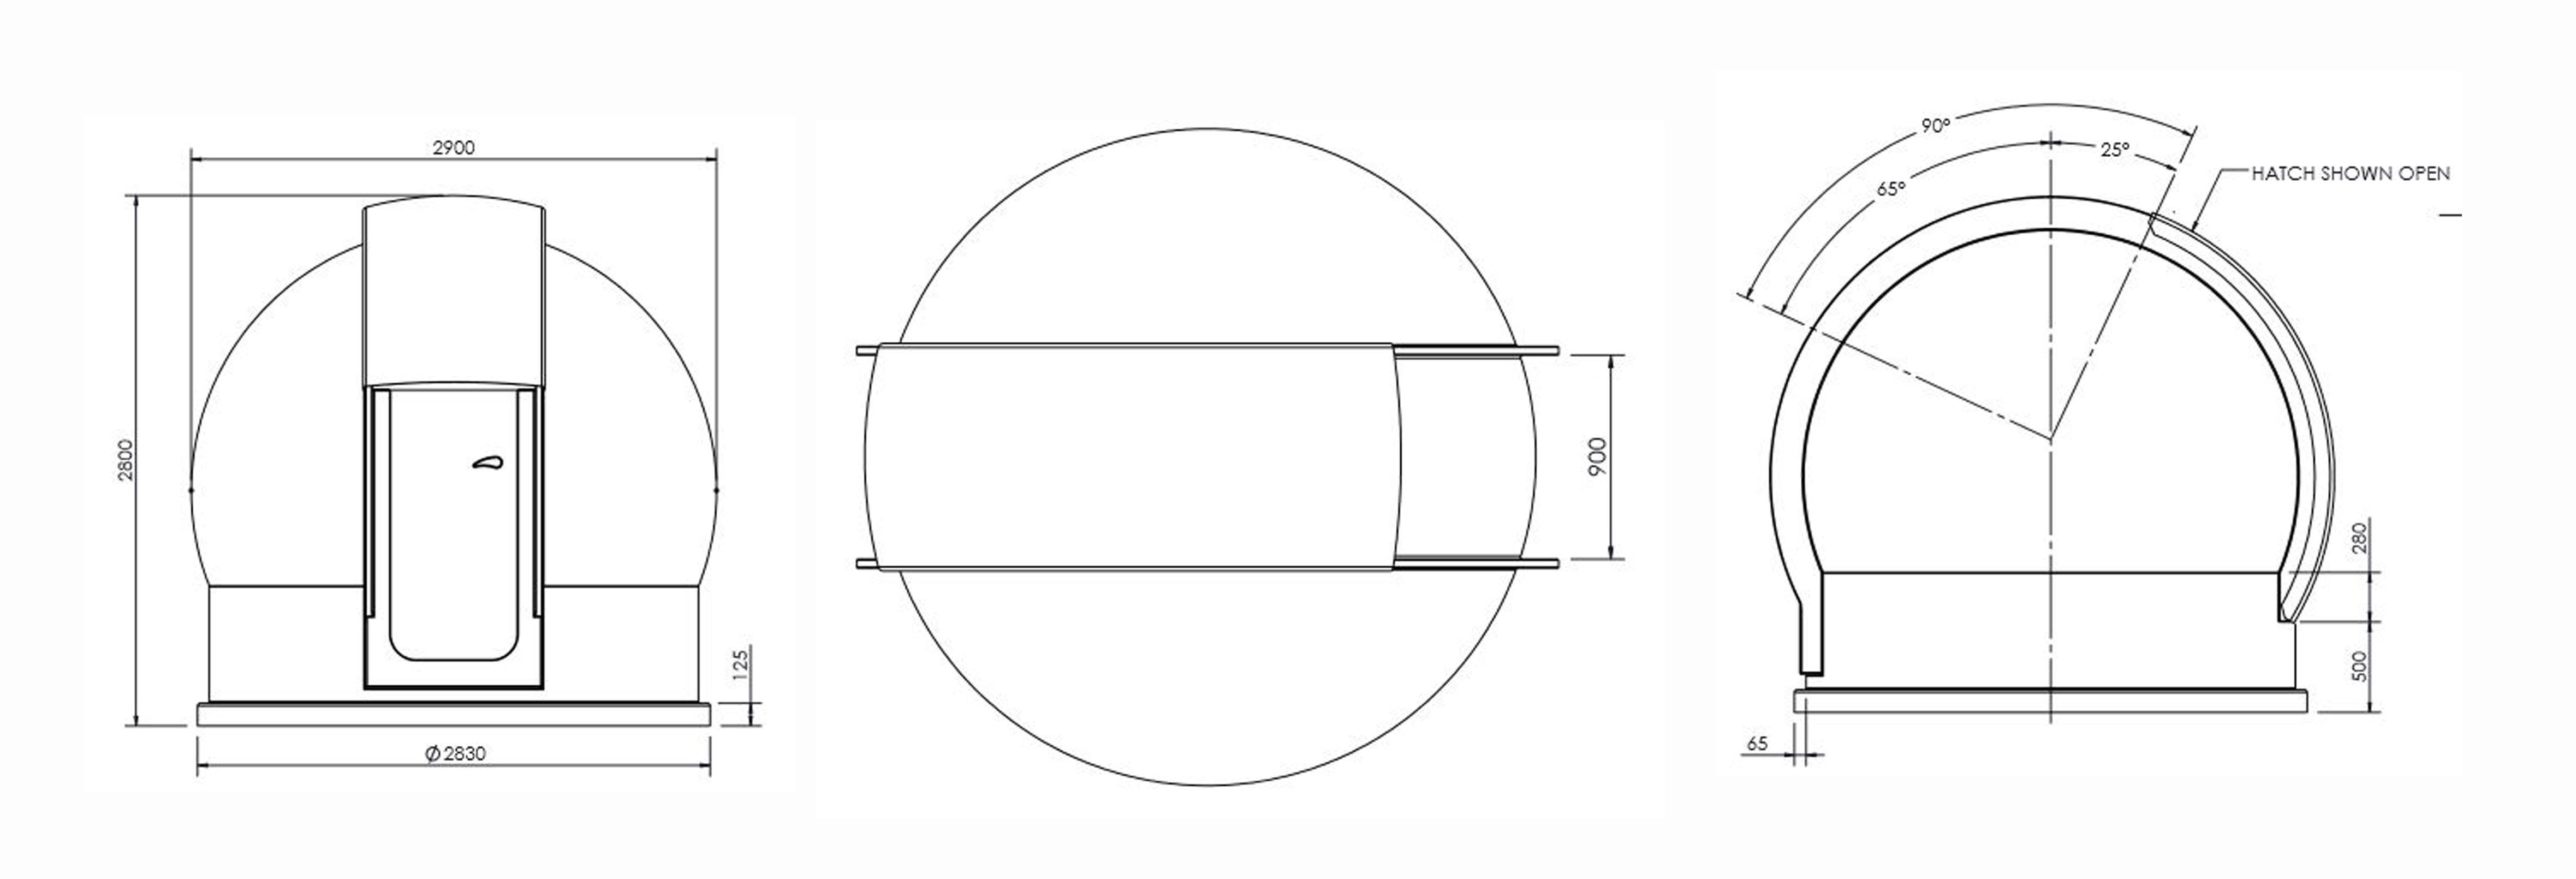 9.5ft (2.9m) Fiberglass Astrodome